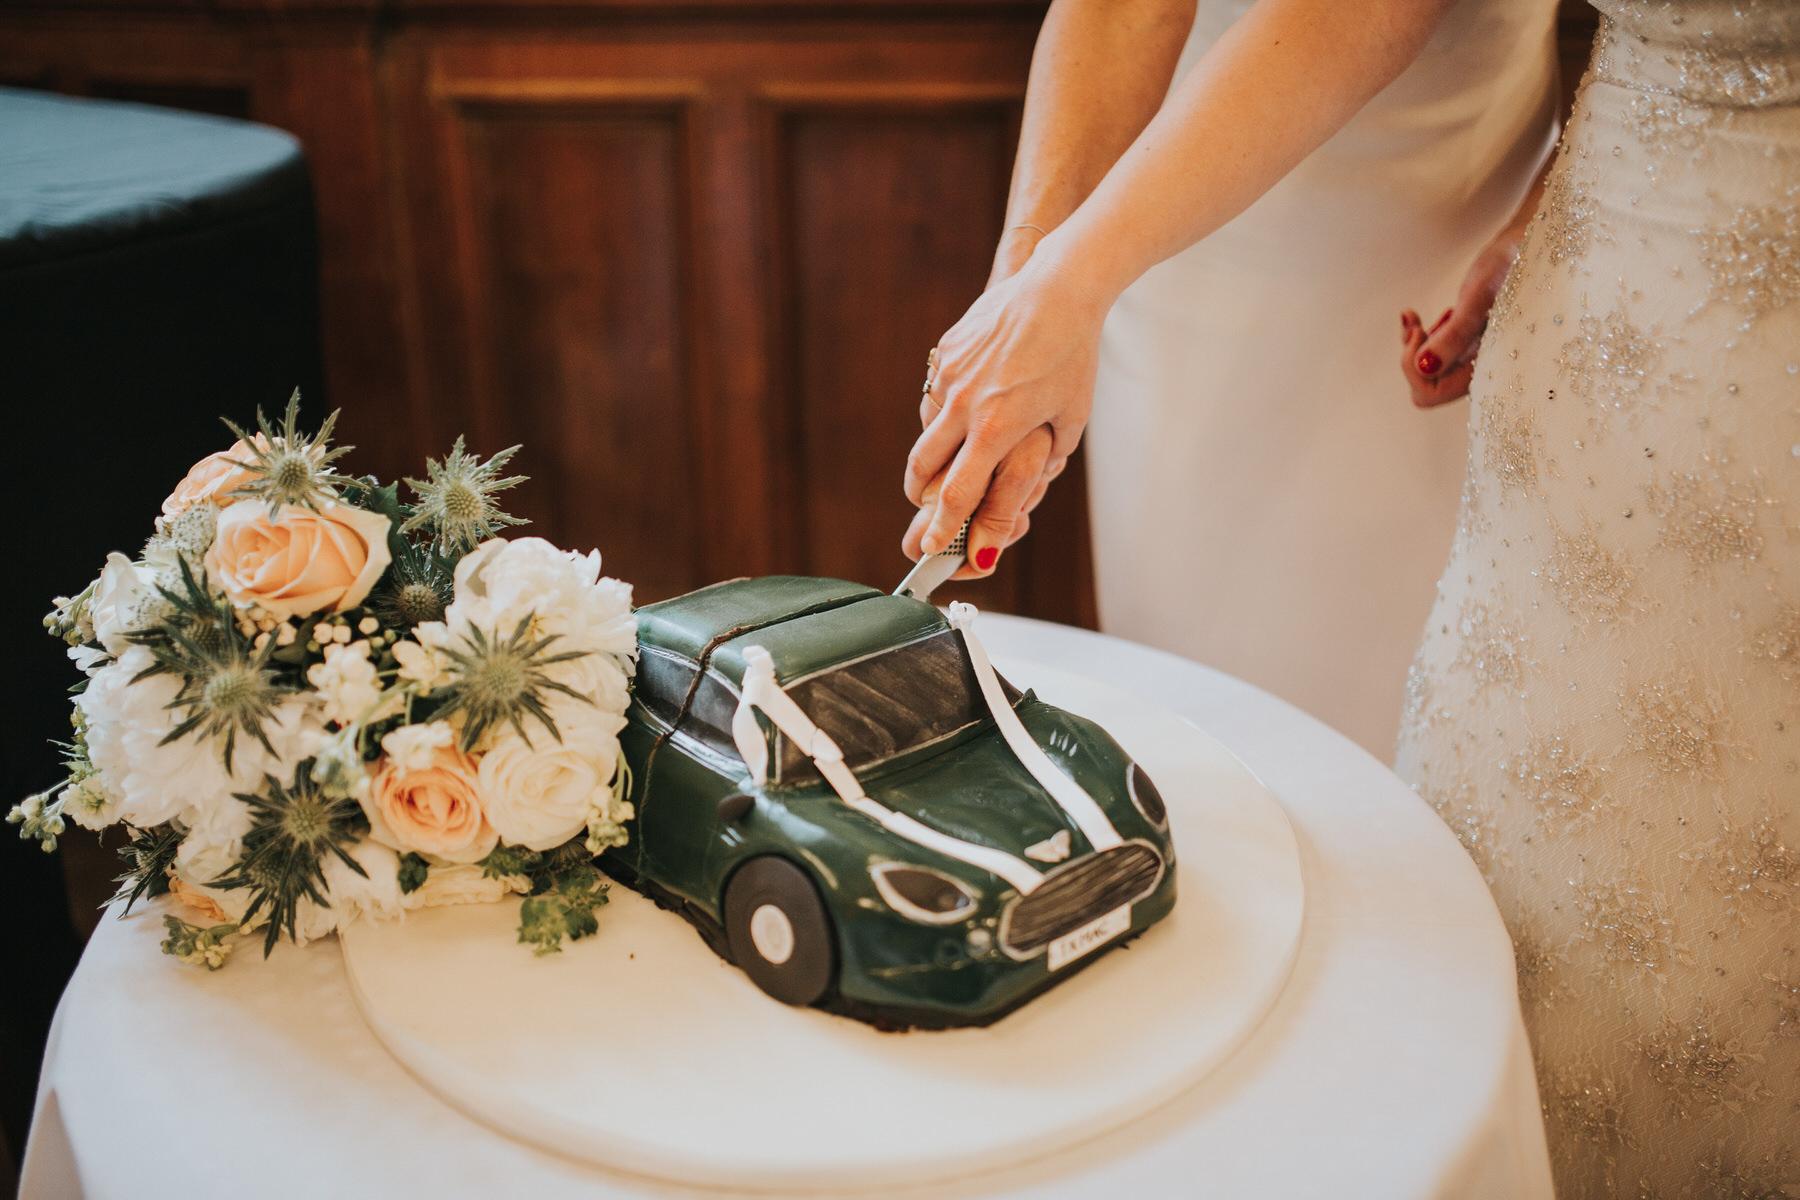 248 two brides cutting green sports car cake.jpg